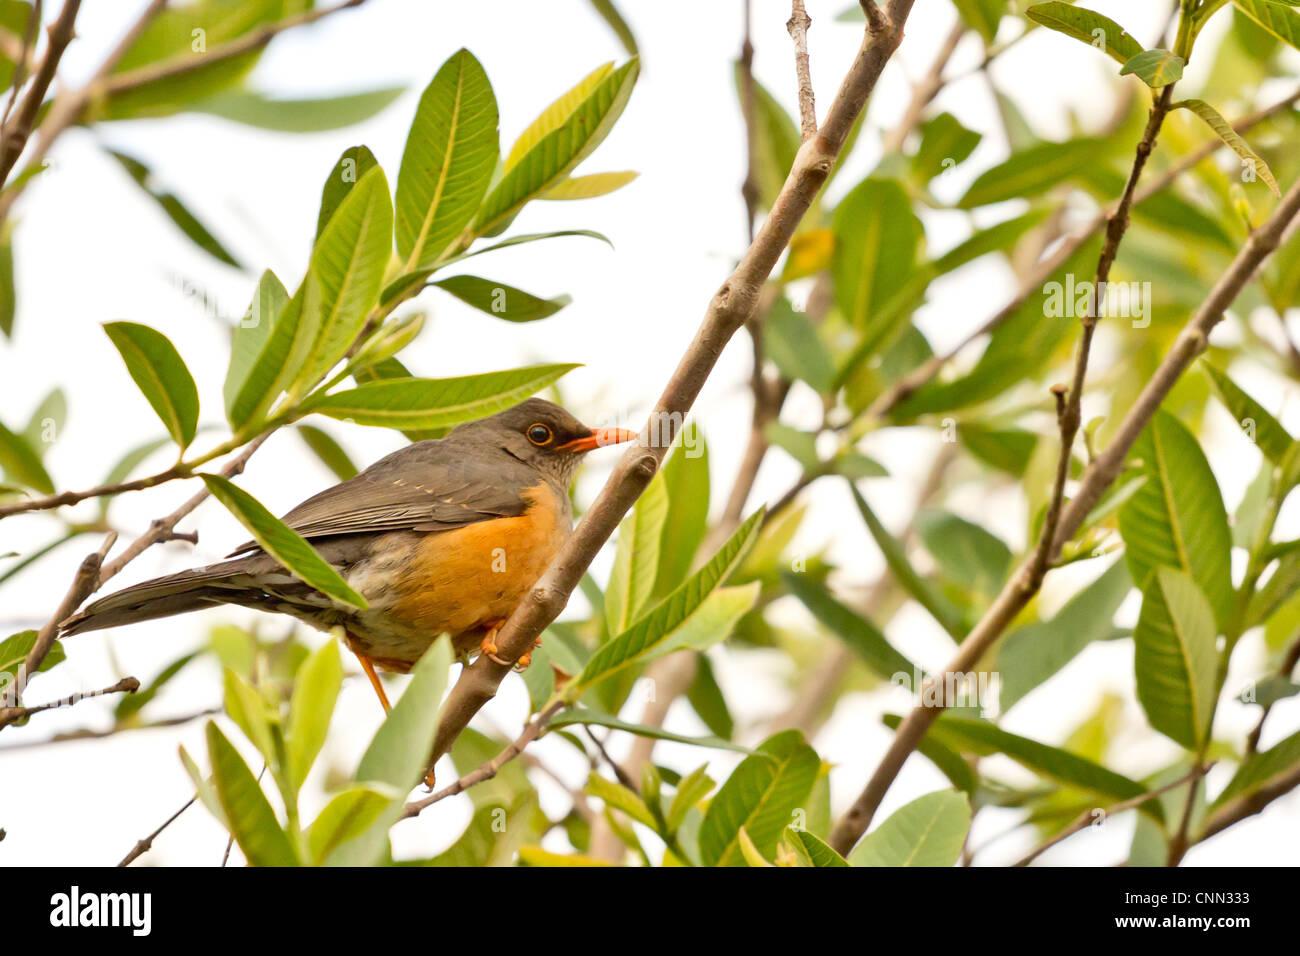 Beautilful bird with orange beak on a tree - Stock Image